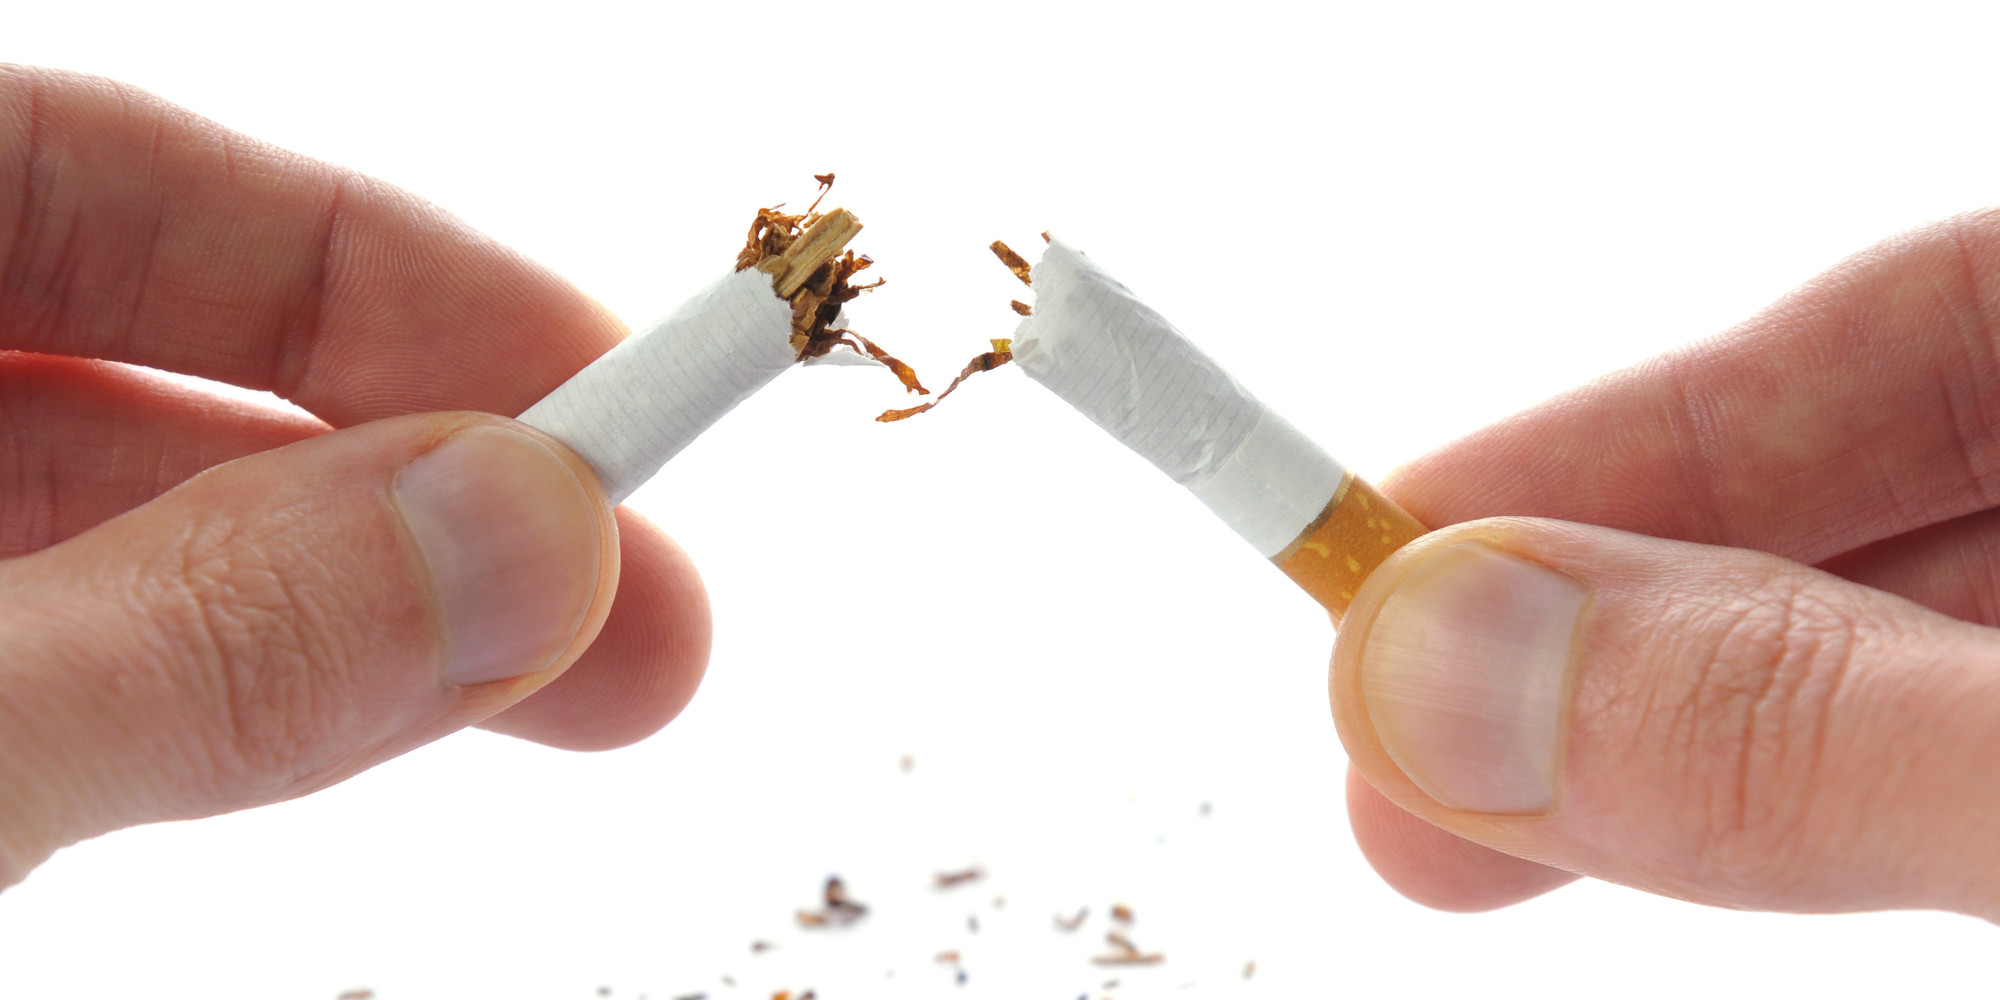 https: img.okeinfo.net content 2016 09 02 481 1479600 30-persen-anggaran-bpjs-kesehatan-untuk-penyakit-akibat-rokok-b452noqSMz.jpg